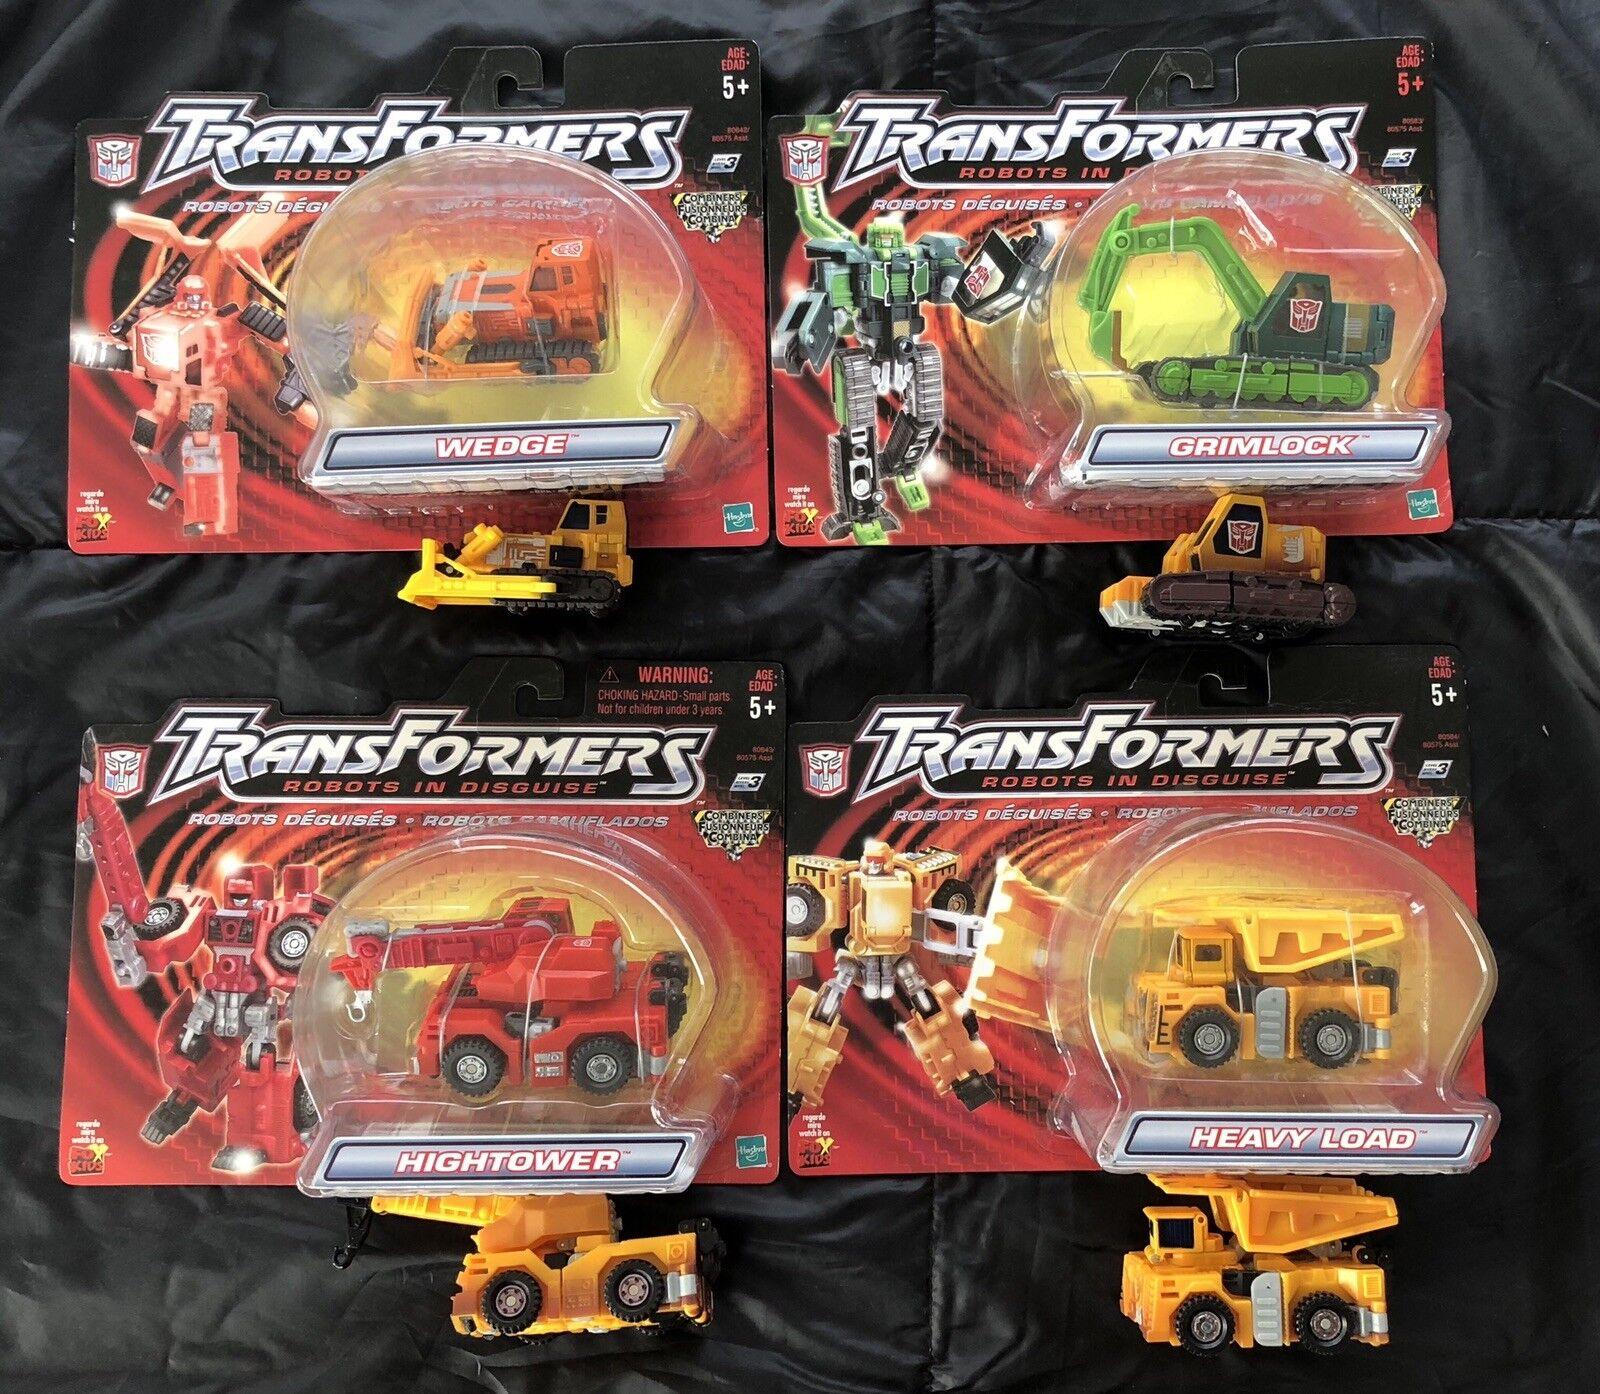 2 Set, Hasbro Transformers Robots In Disguise disautoicaDevastator, 2001,